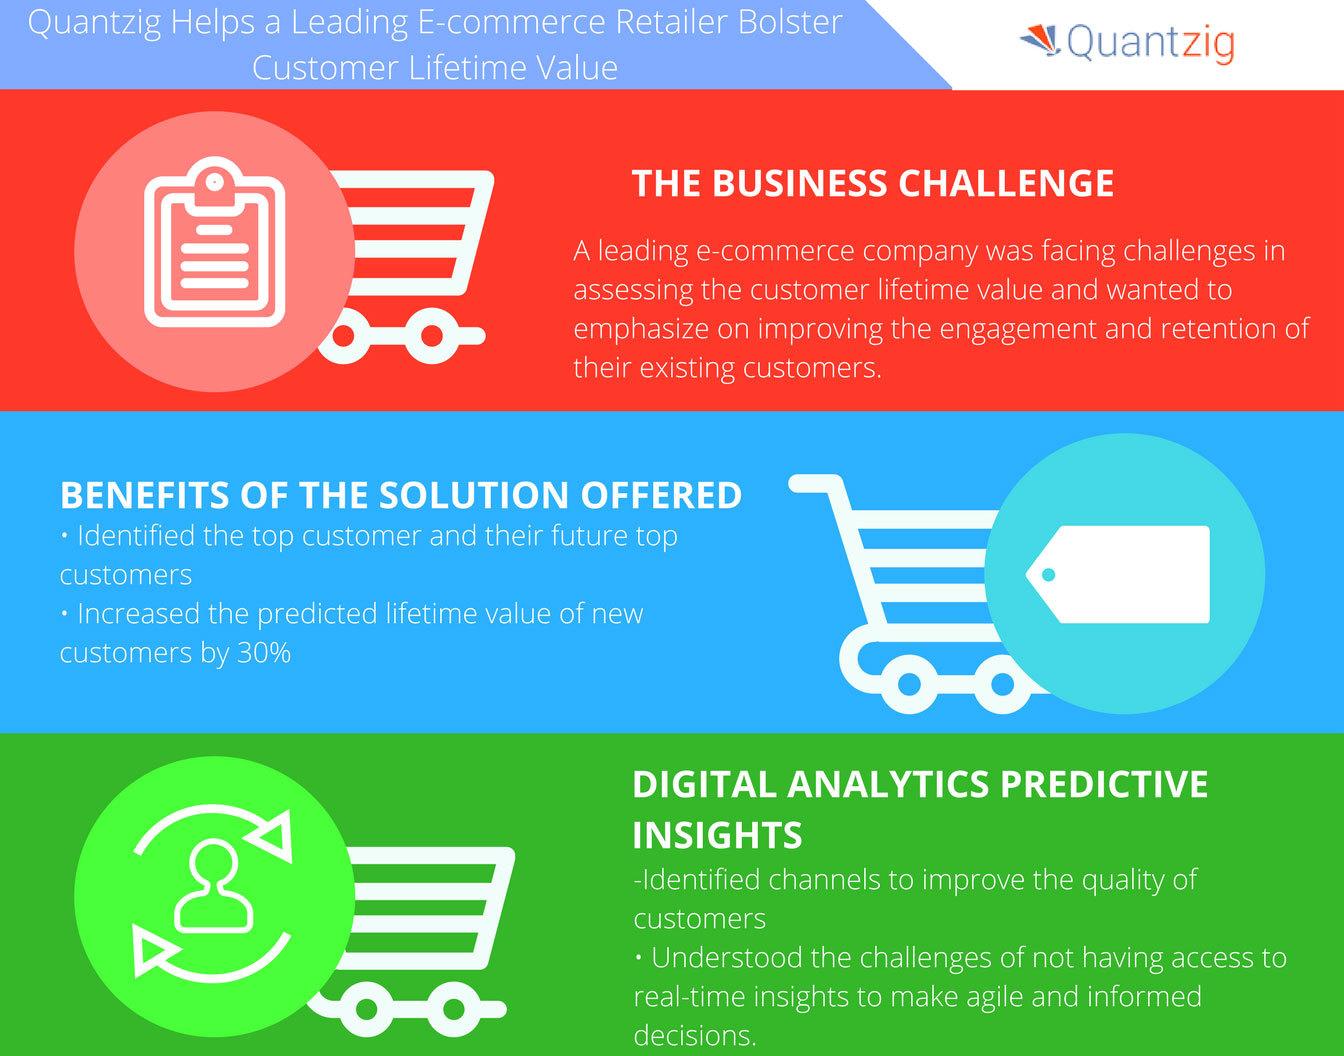 Predictive Analytics Helps Increase Customer Lifetime Value